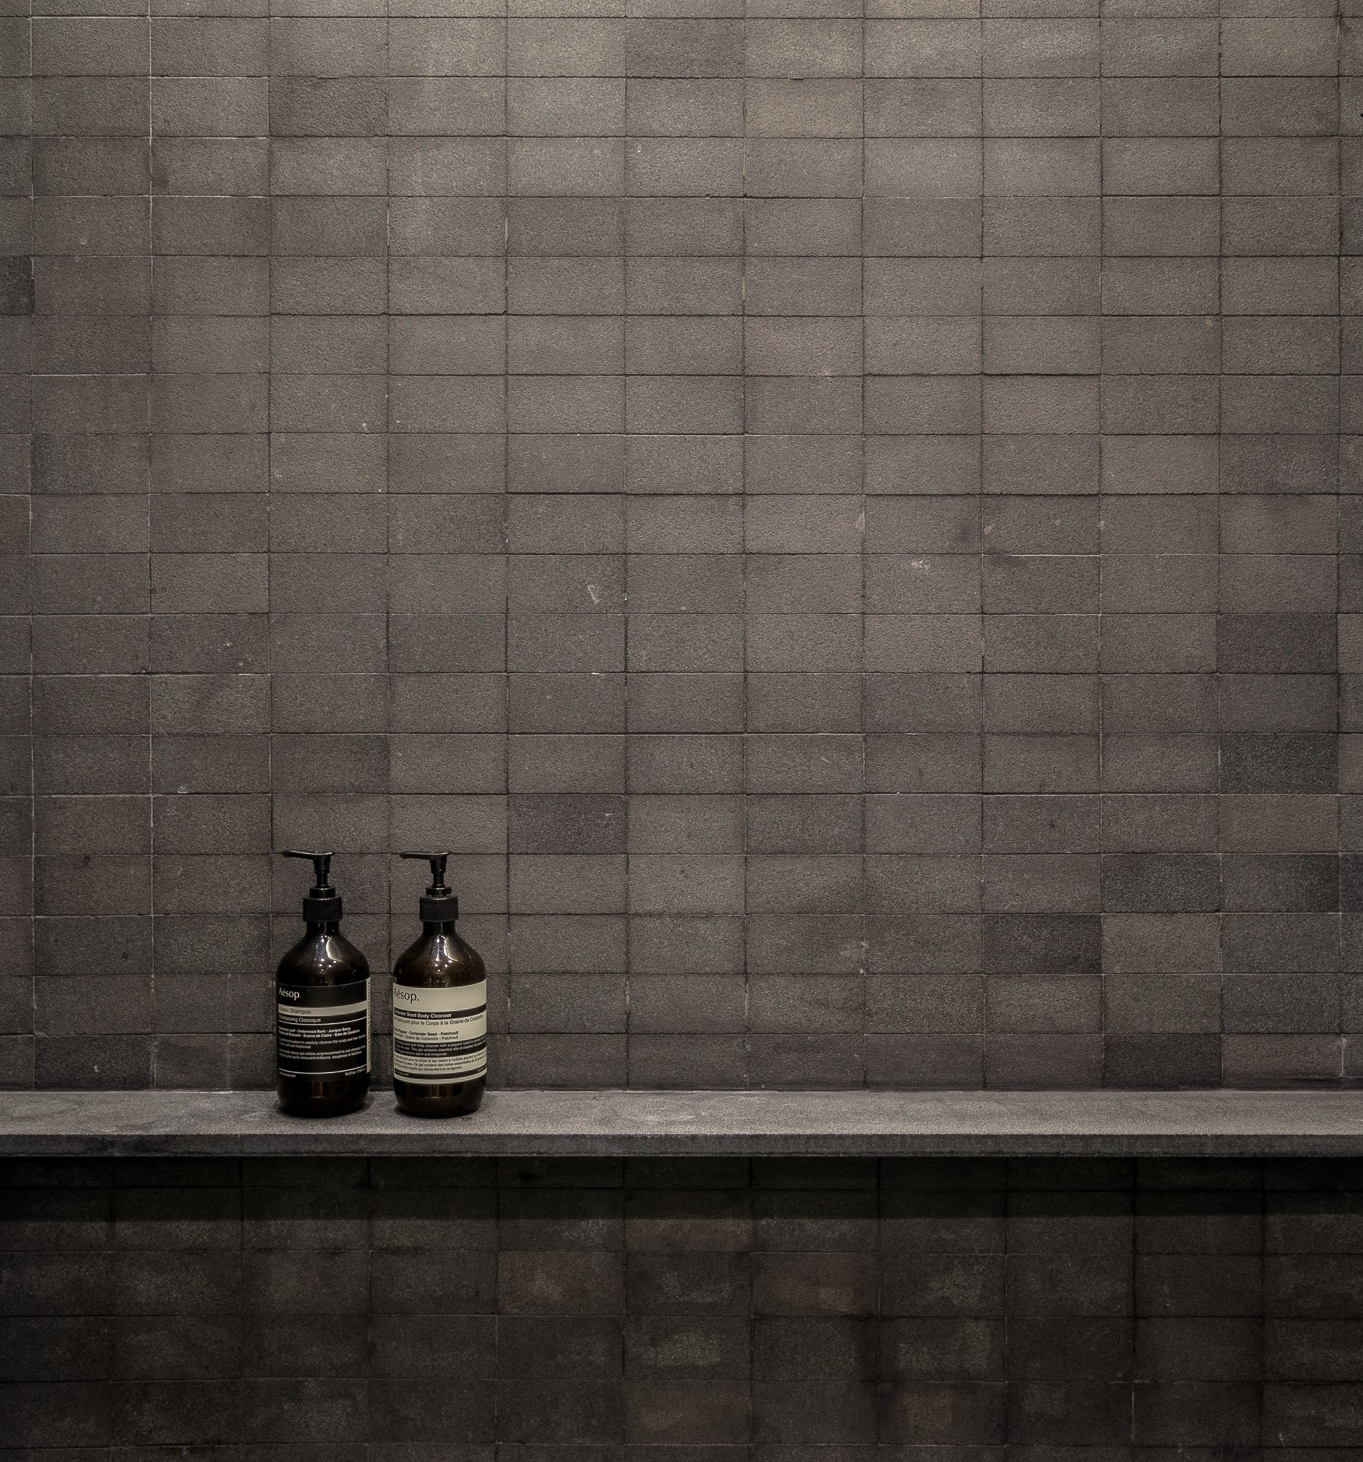 Thonglor residence_shower room